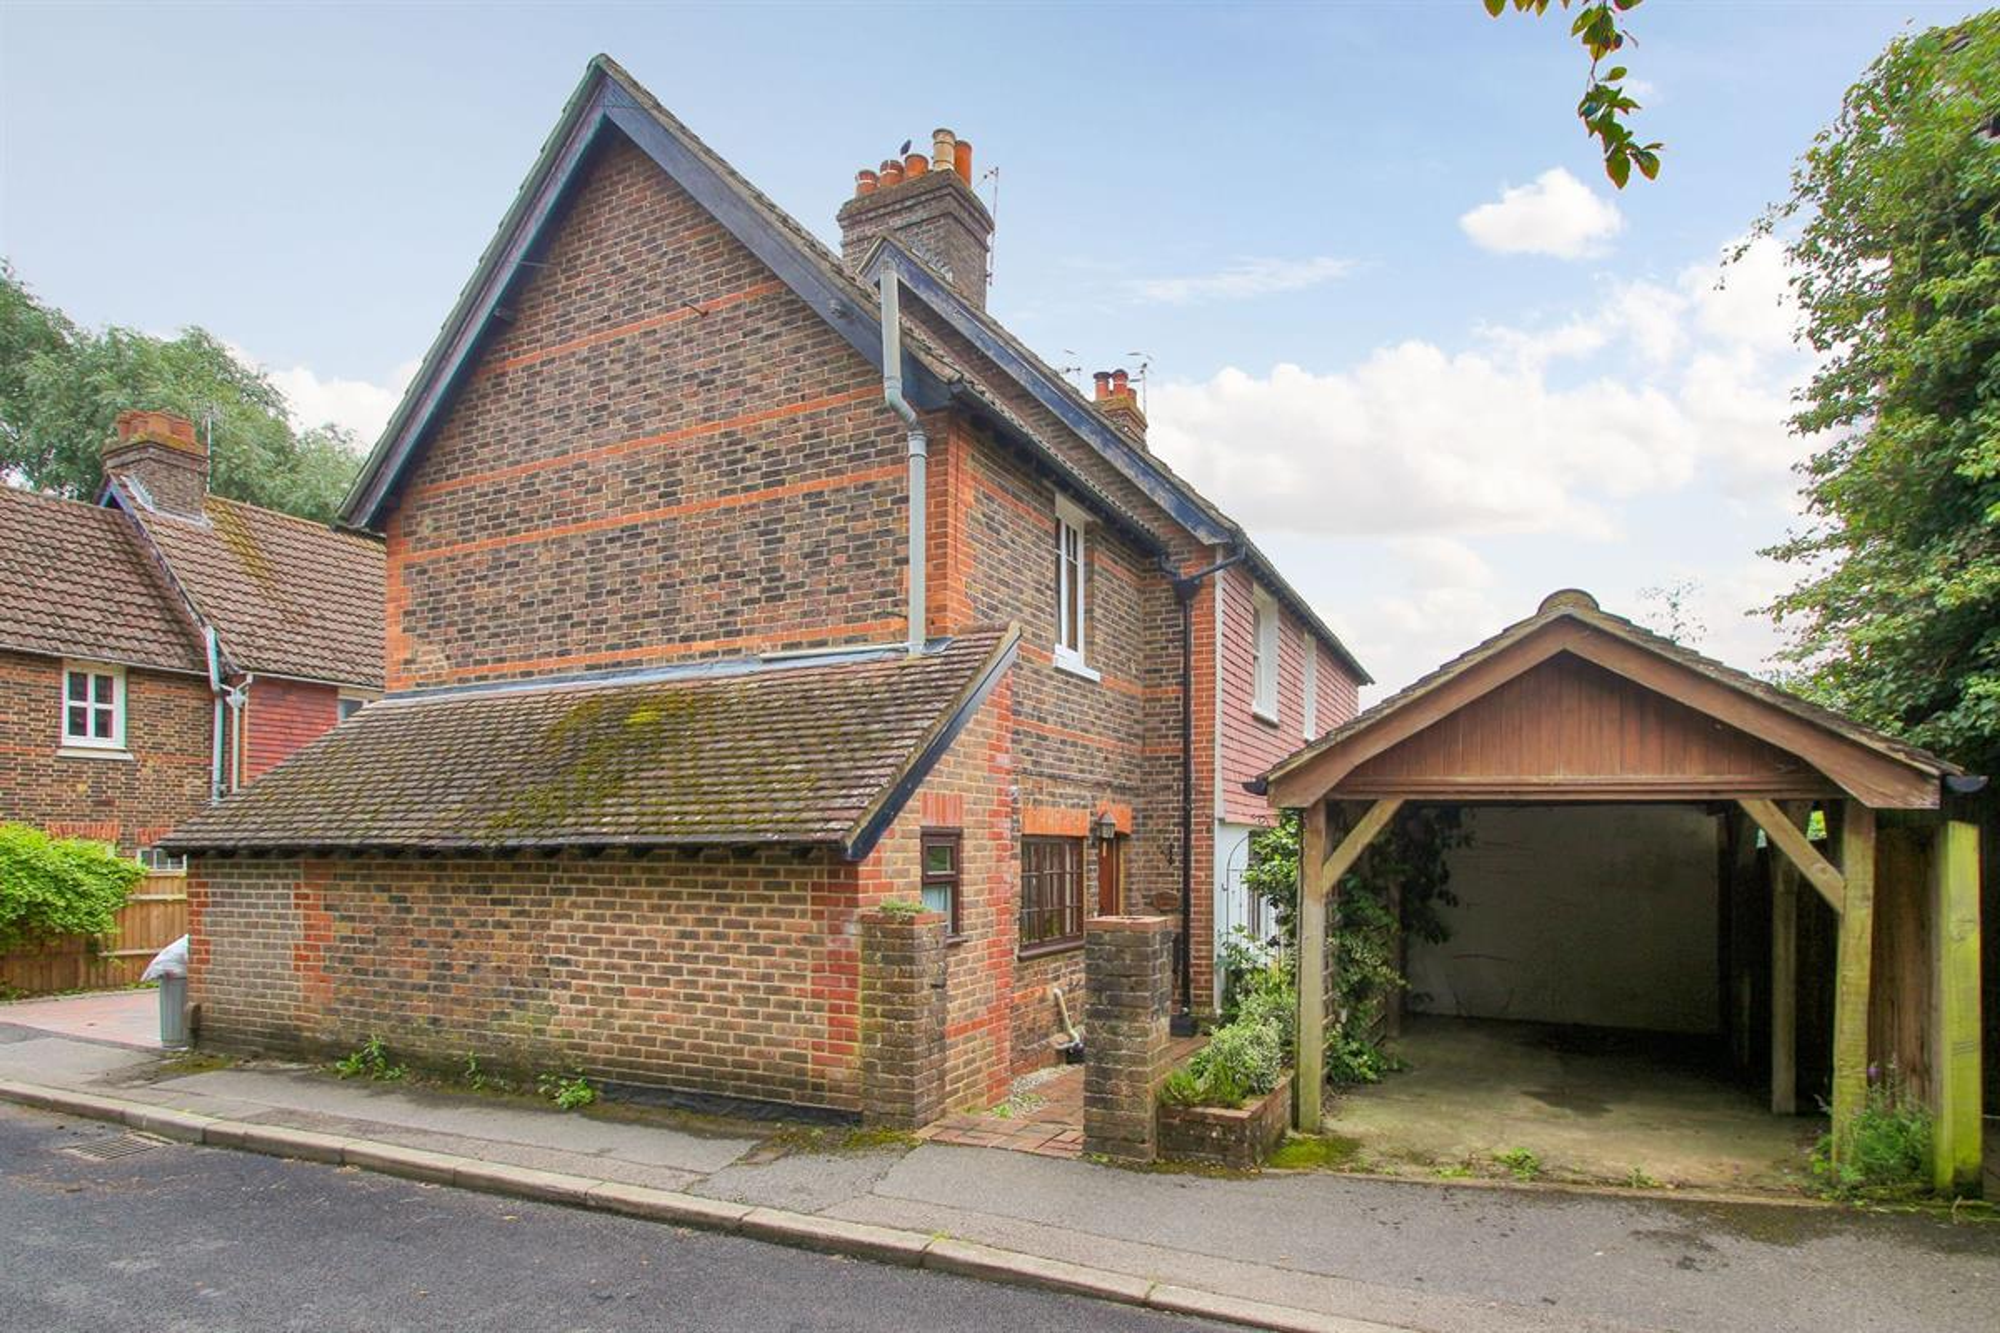 Foresters Cottages, Mead Road, Edenbridge